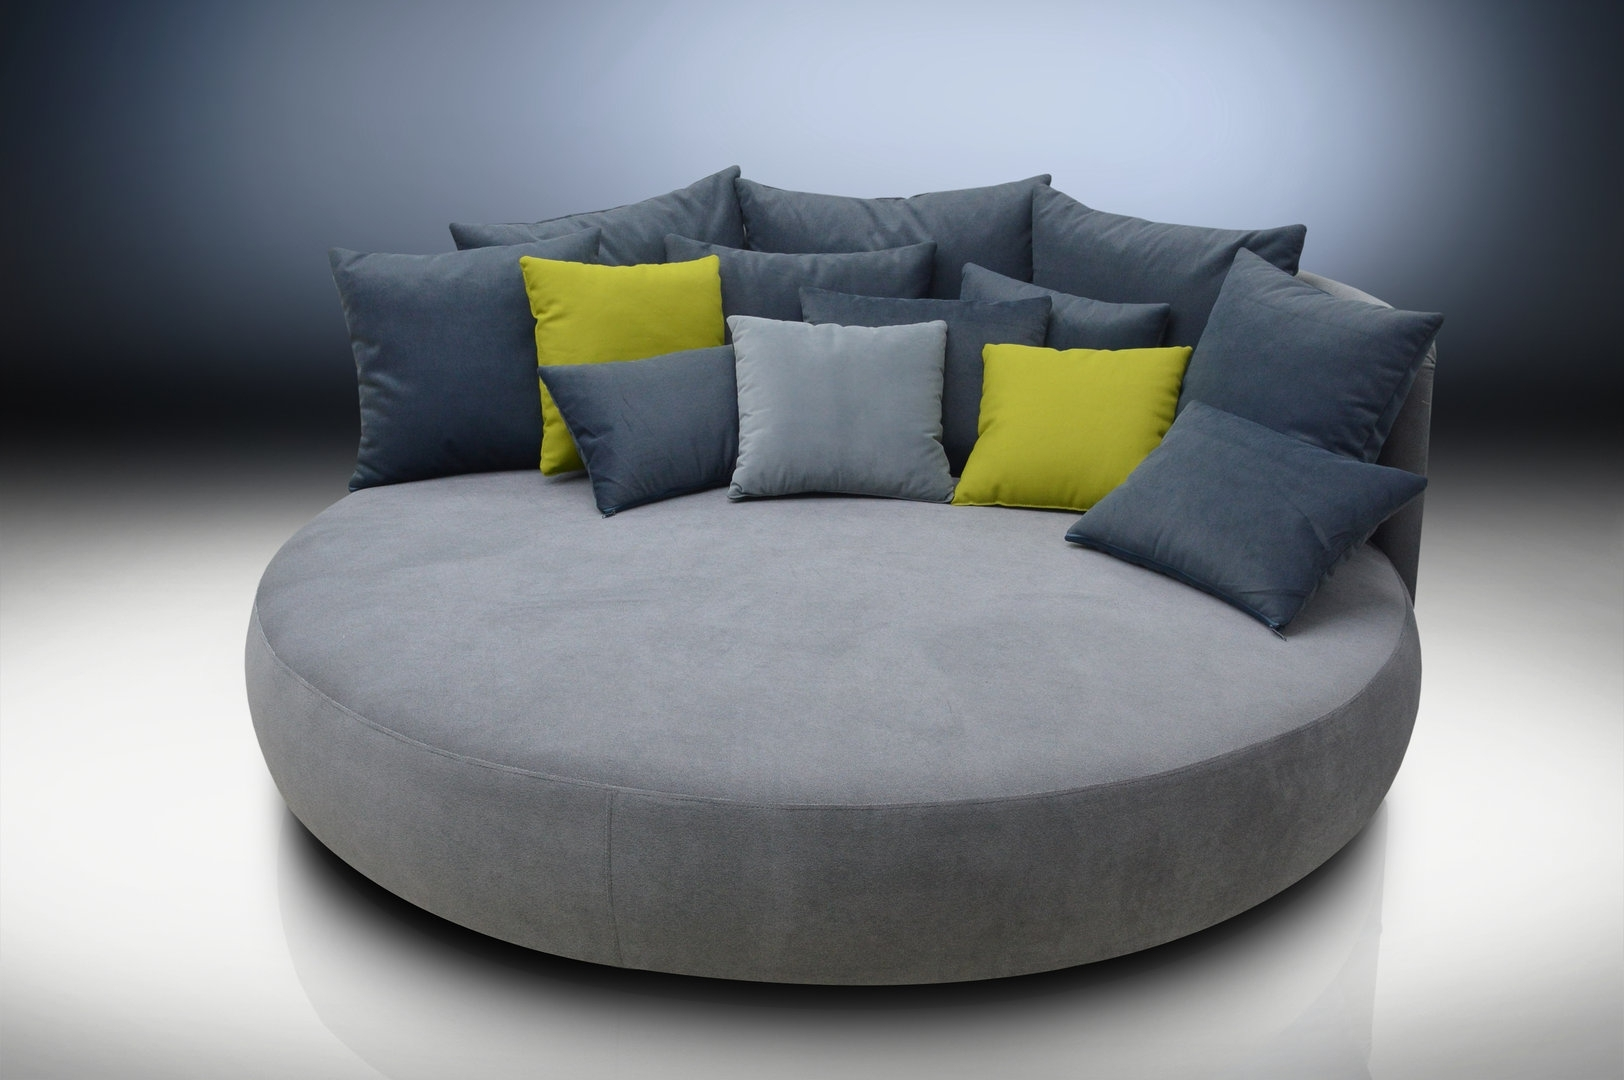 Sofa : Sofa Chair Round Elegant Sofa Half Round Sofa Sofas Round Throughout 2018 Round Sofas (View 6 of 15)